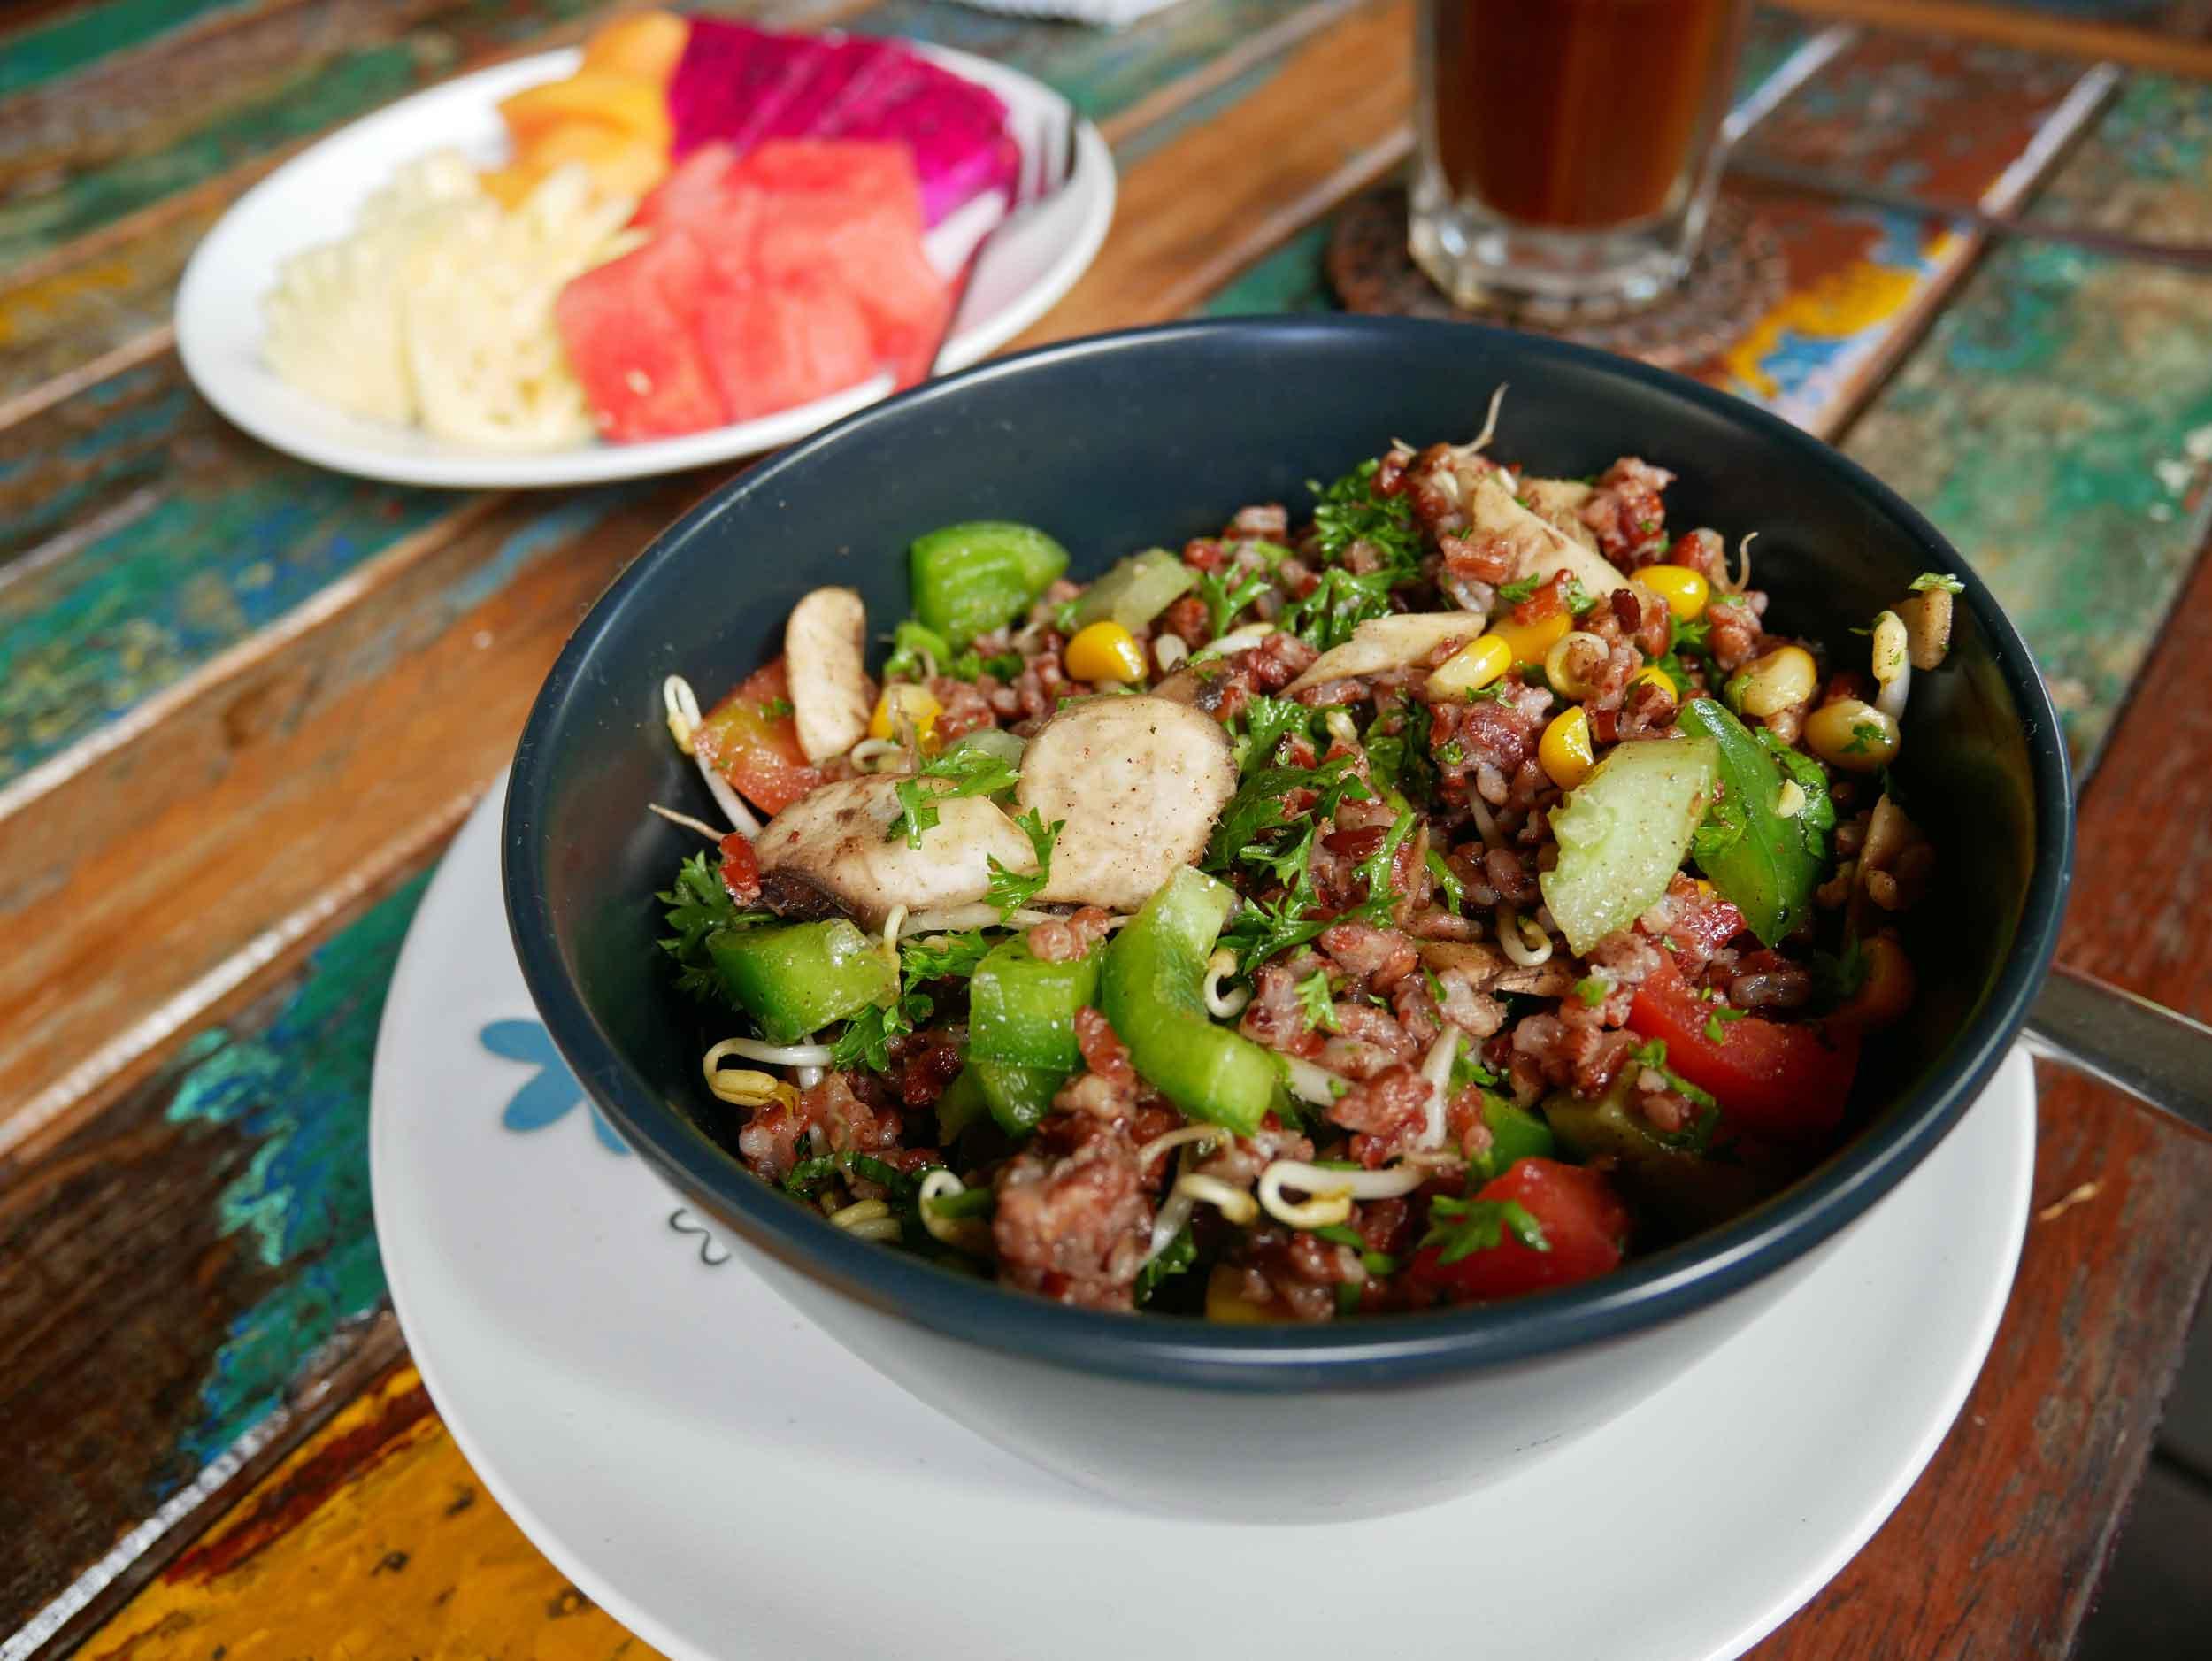 A signature veggie rice bowl and fresh tropical fruit at Bali Eco Deli (May 15).